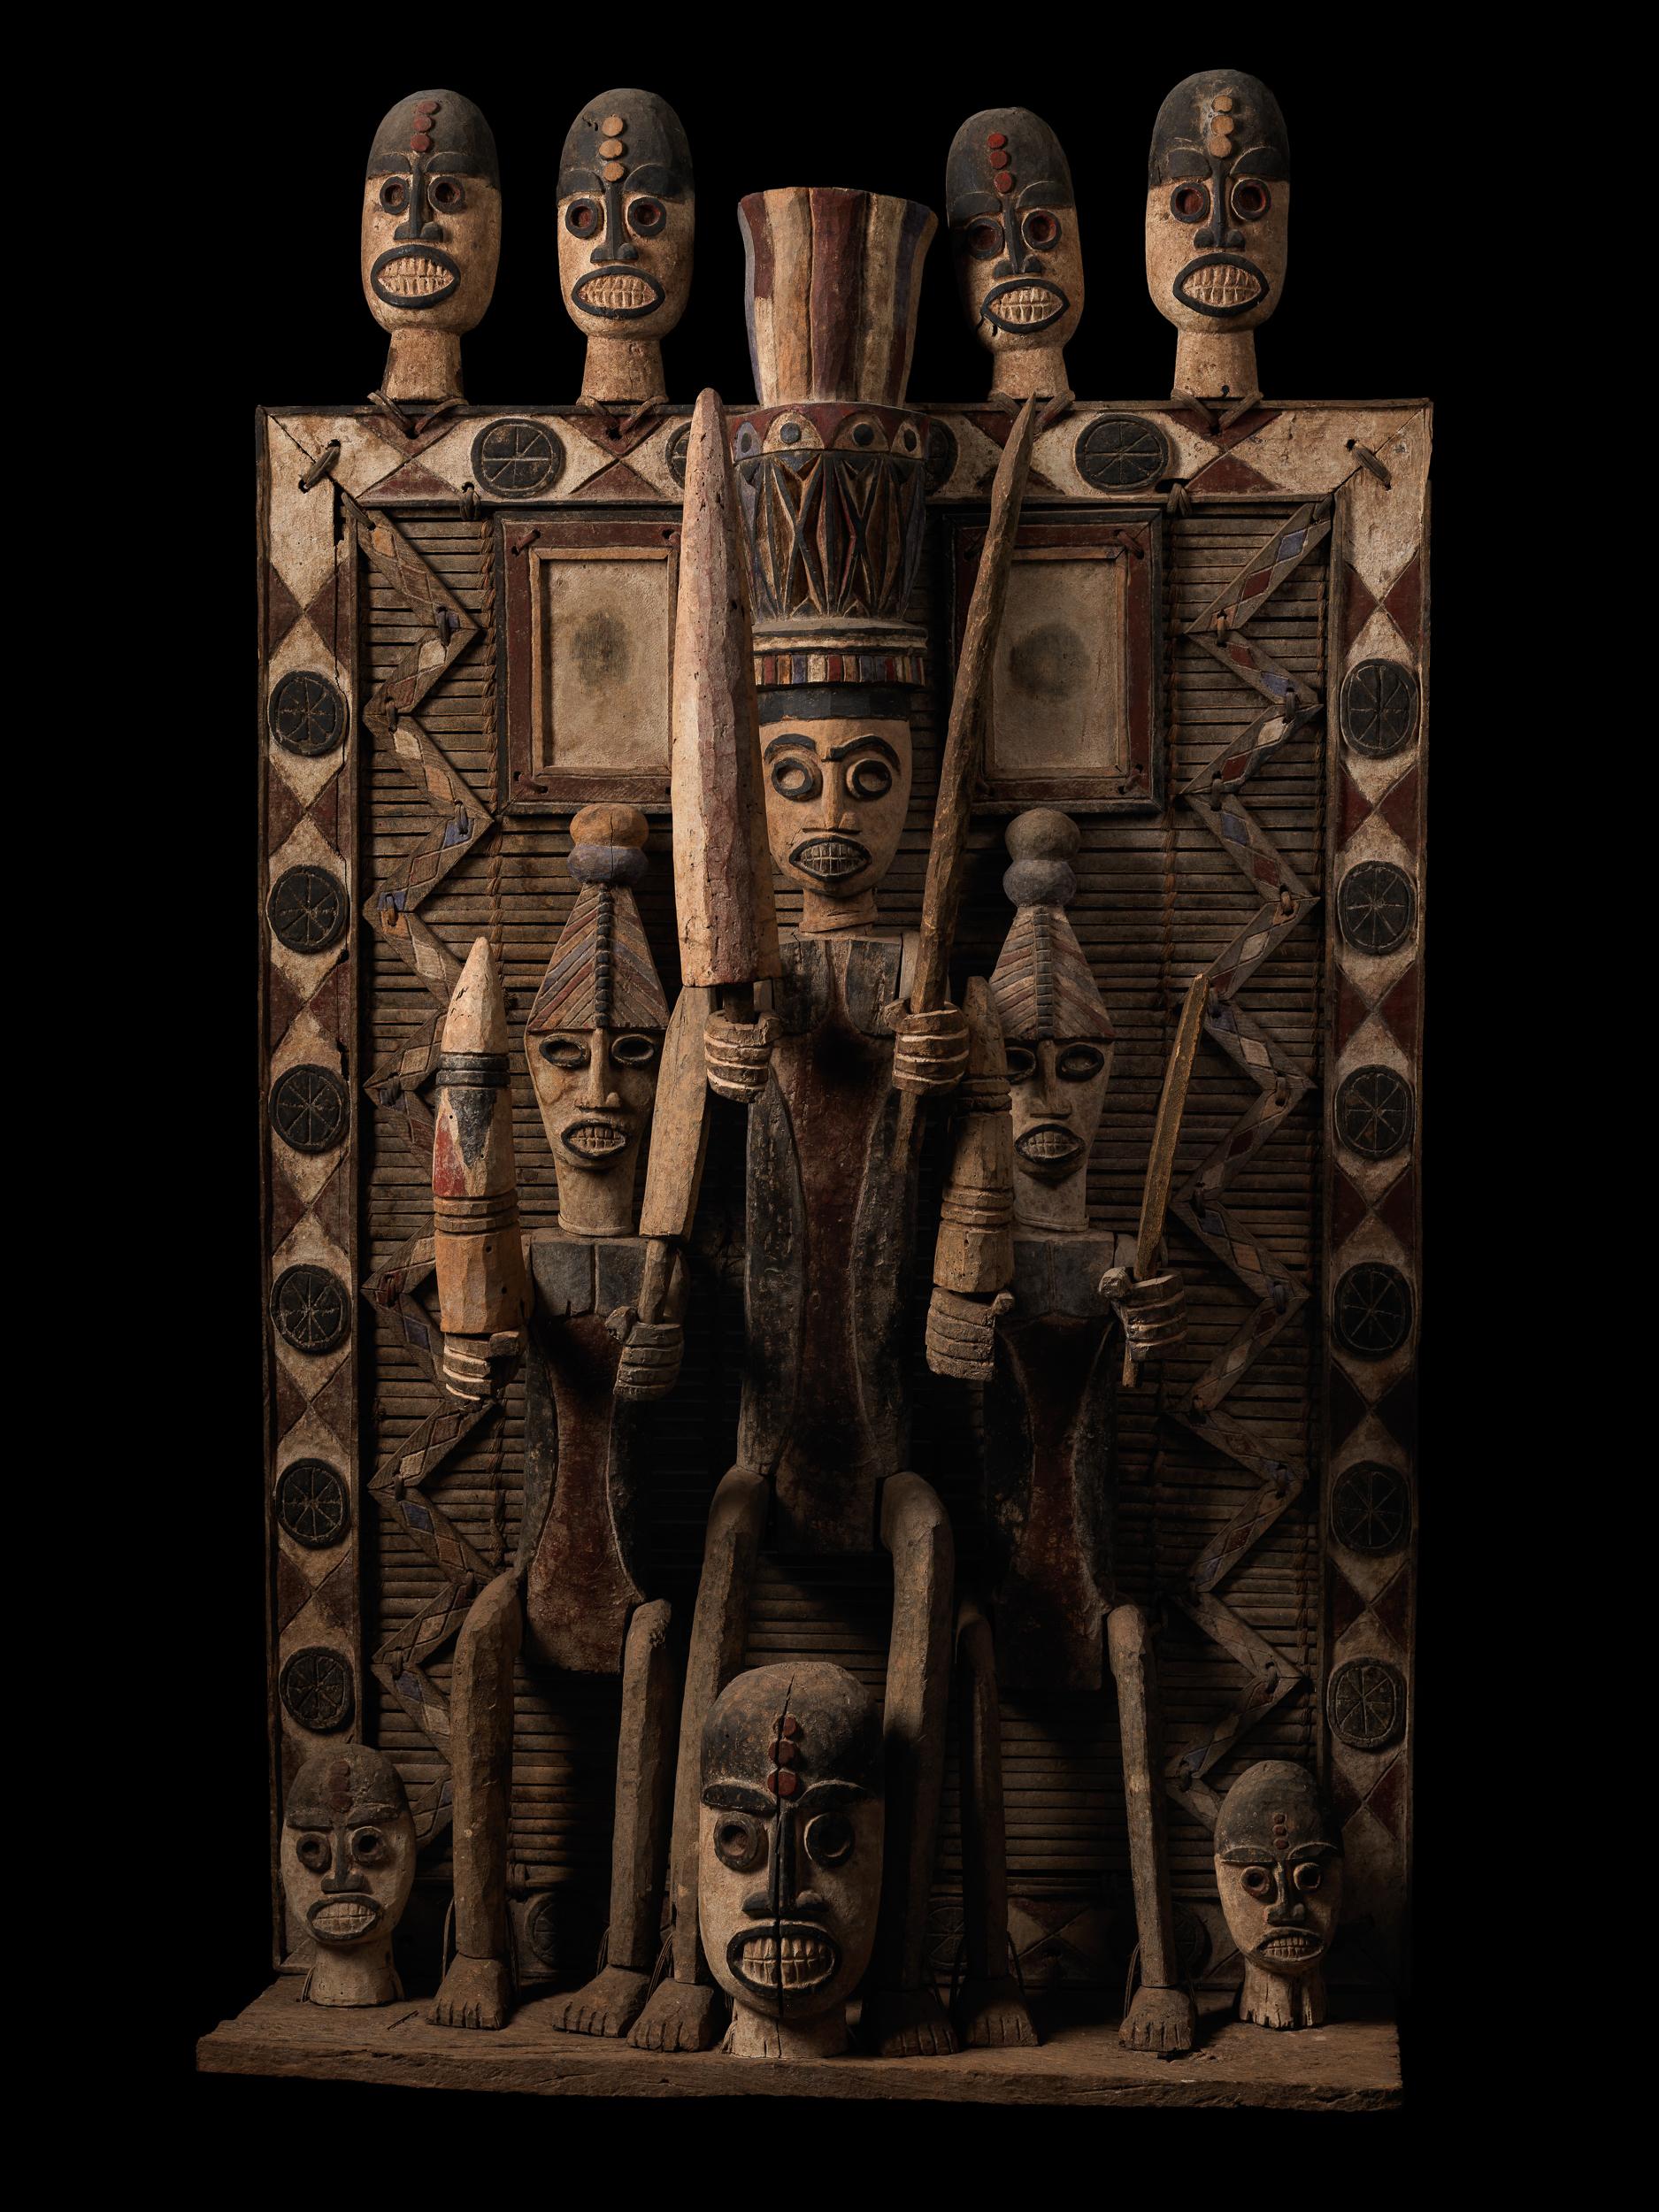 Shrine panel Nigeria, Kalabari group Ijo people, mid-20th century  Carved wood, rattan, raffia, natural polychrome pigments Ann Porteus, Sidewalk Tribal Gallery